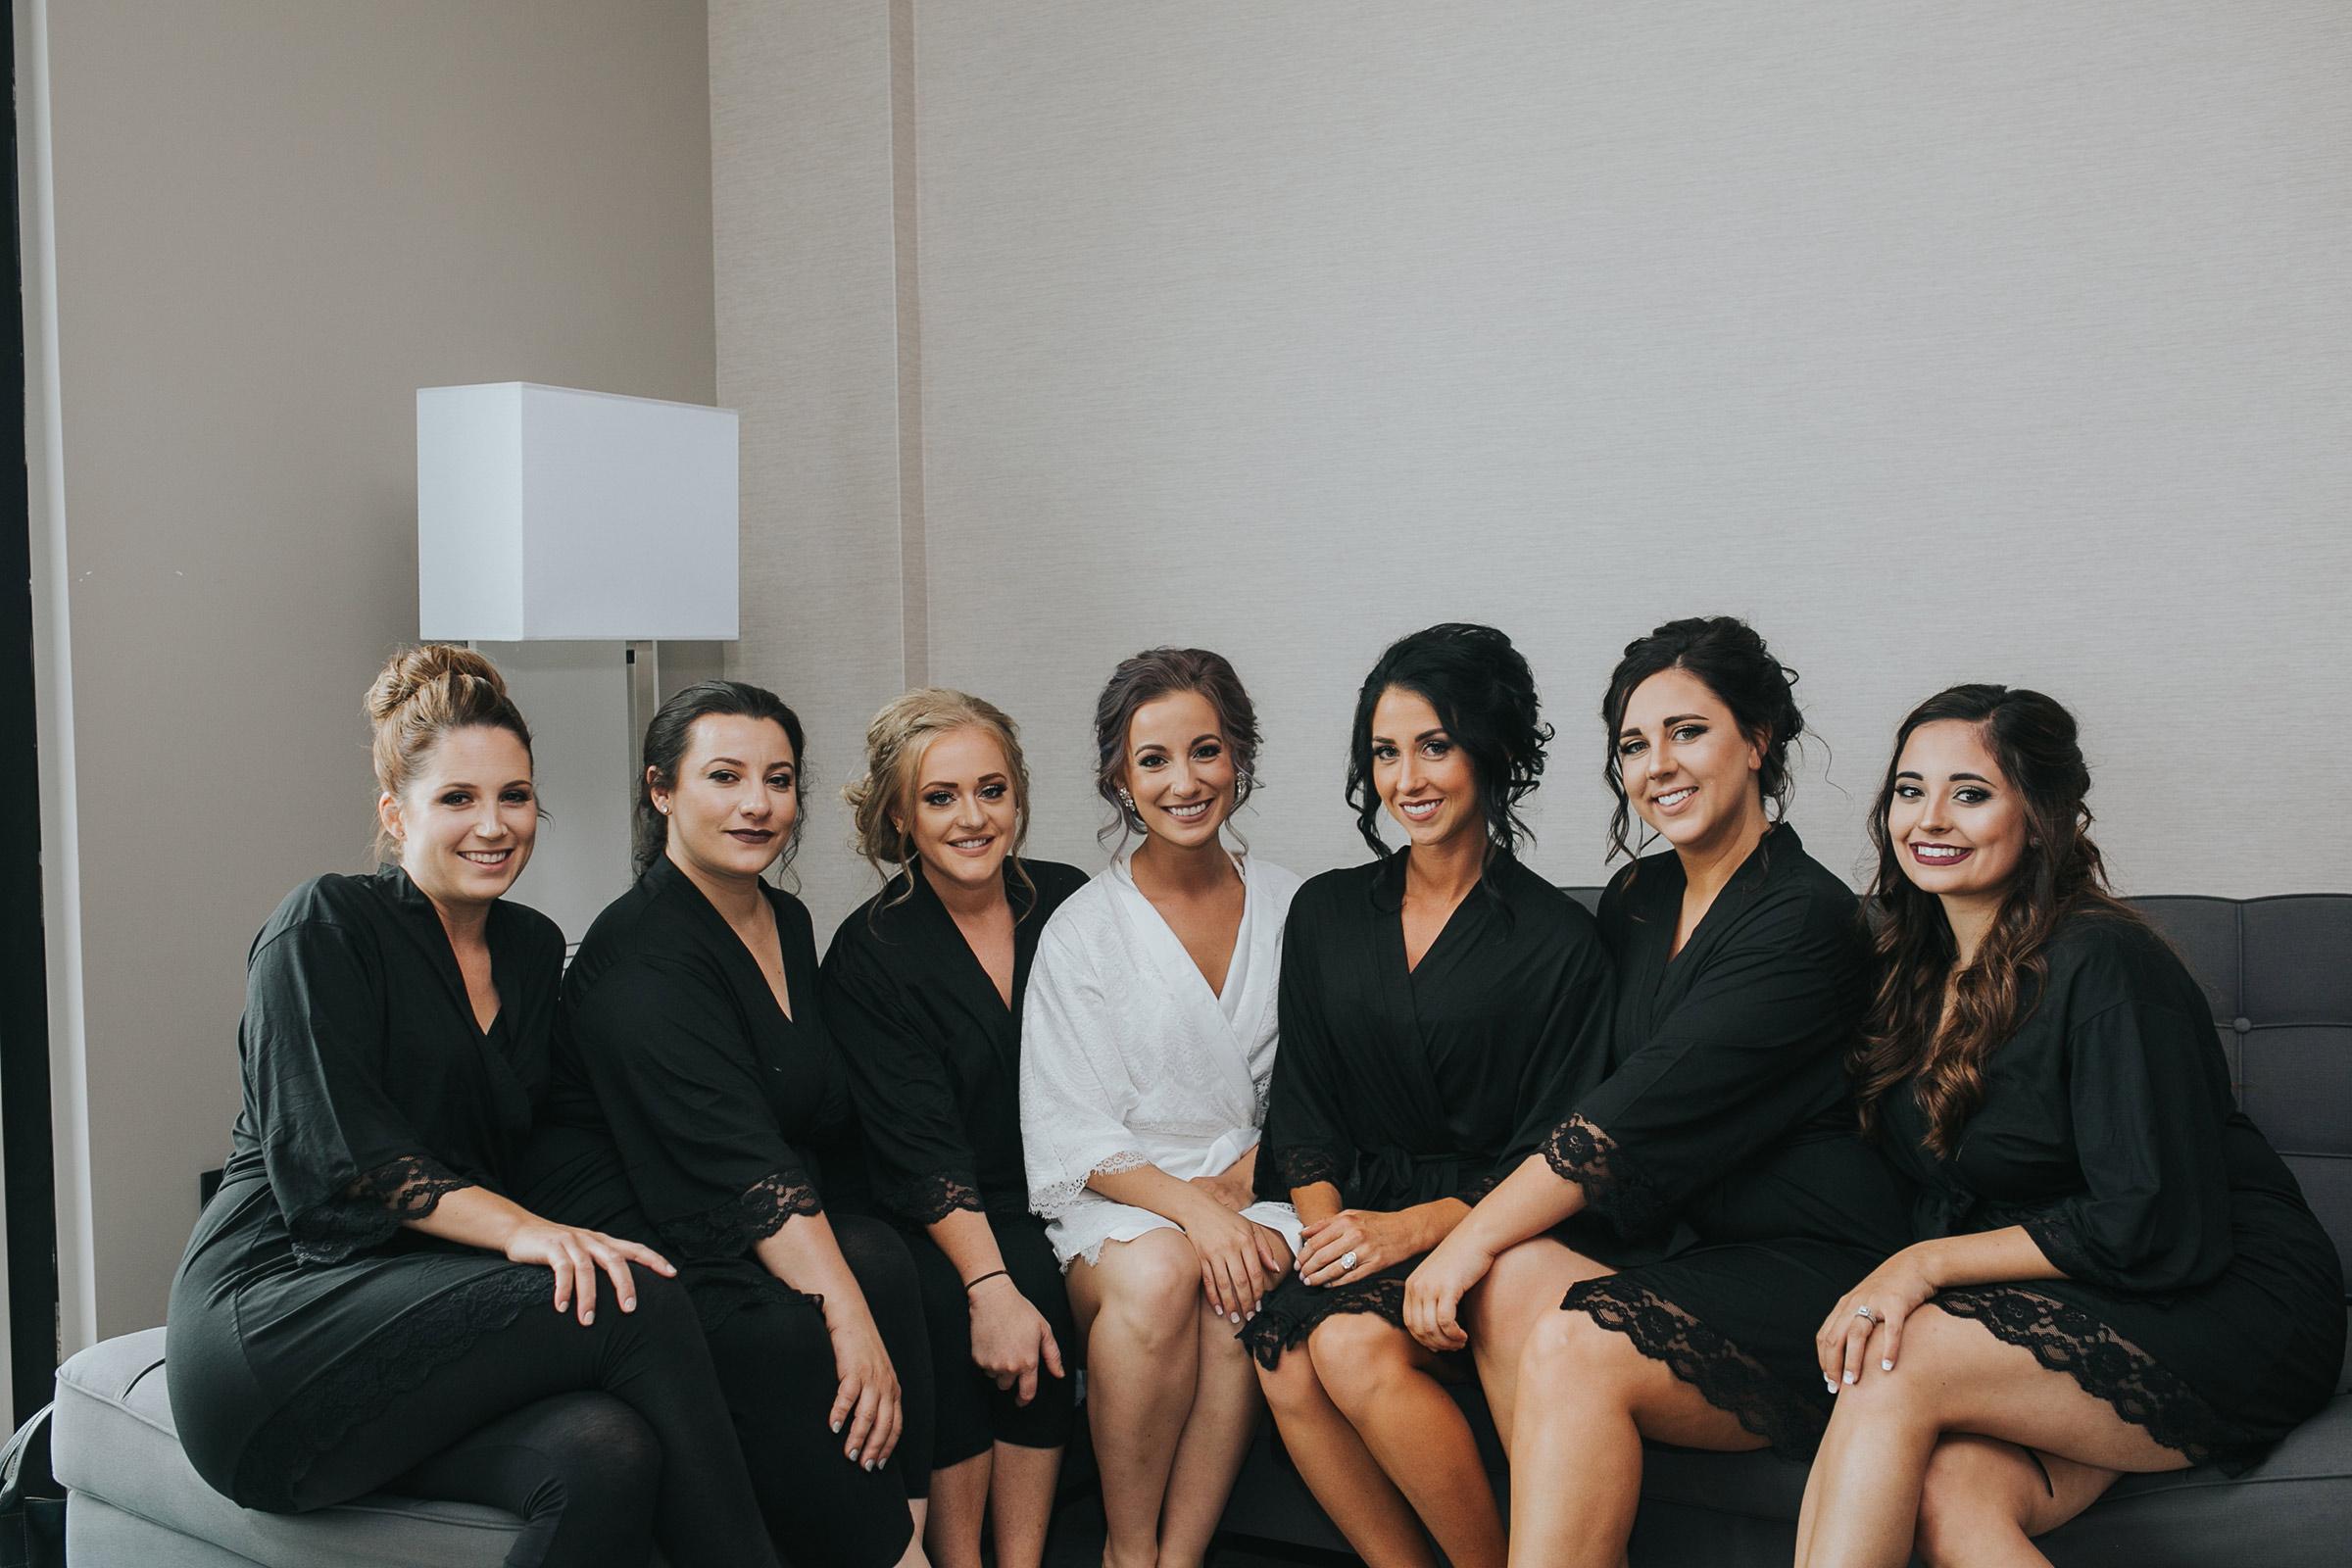 bridesmaids-in-robes-posing-desmoines-iowa-ac-hotel-raelyn-ramey-photography.jpg